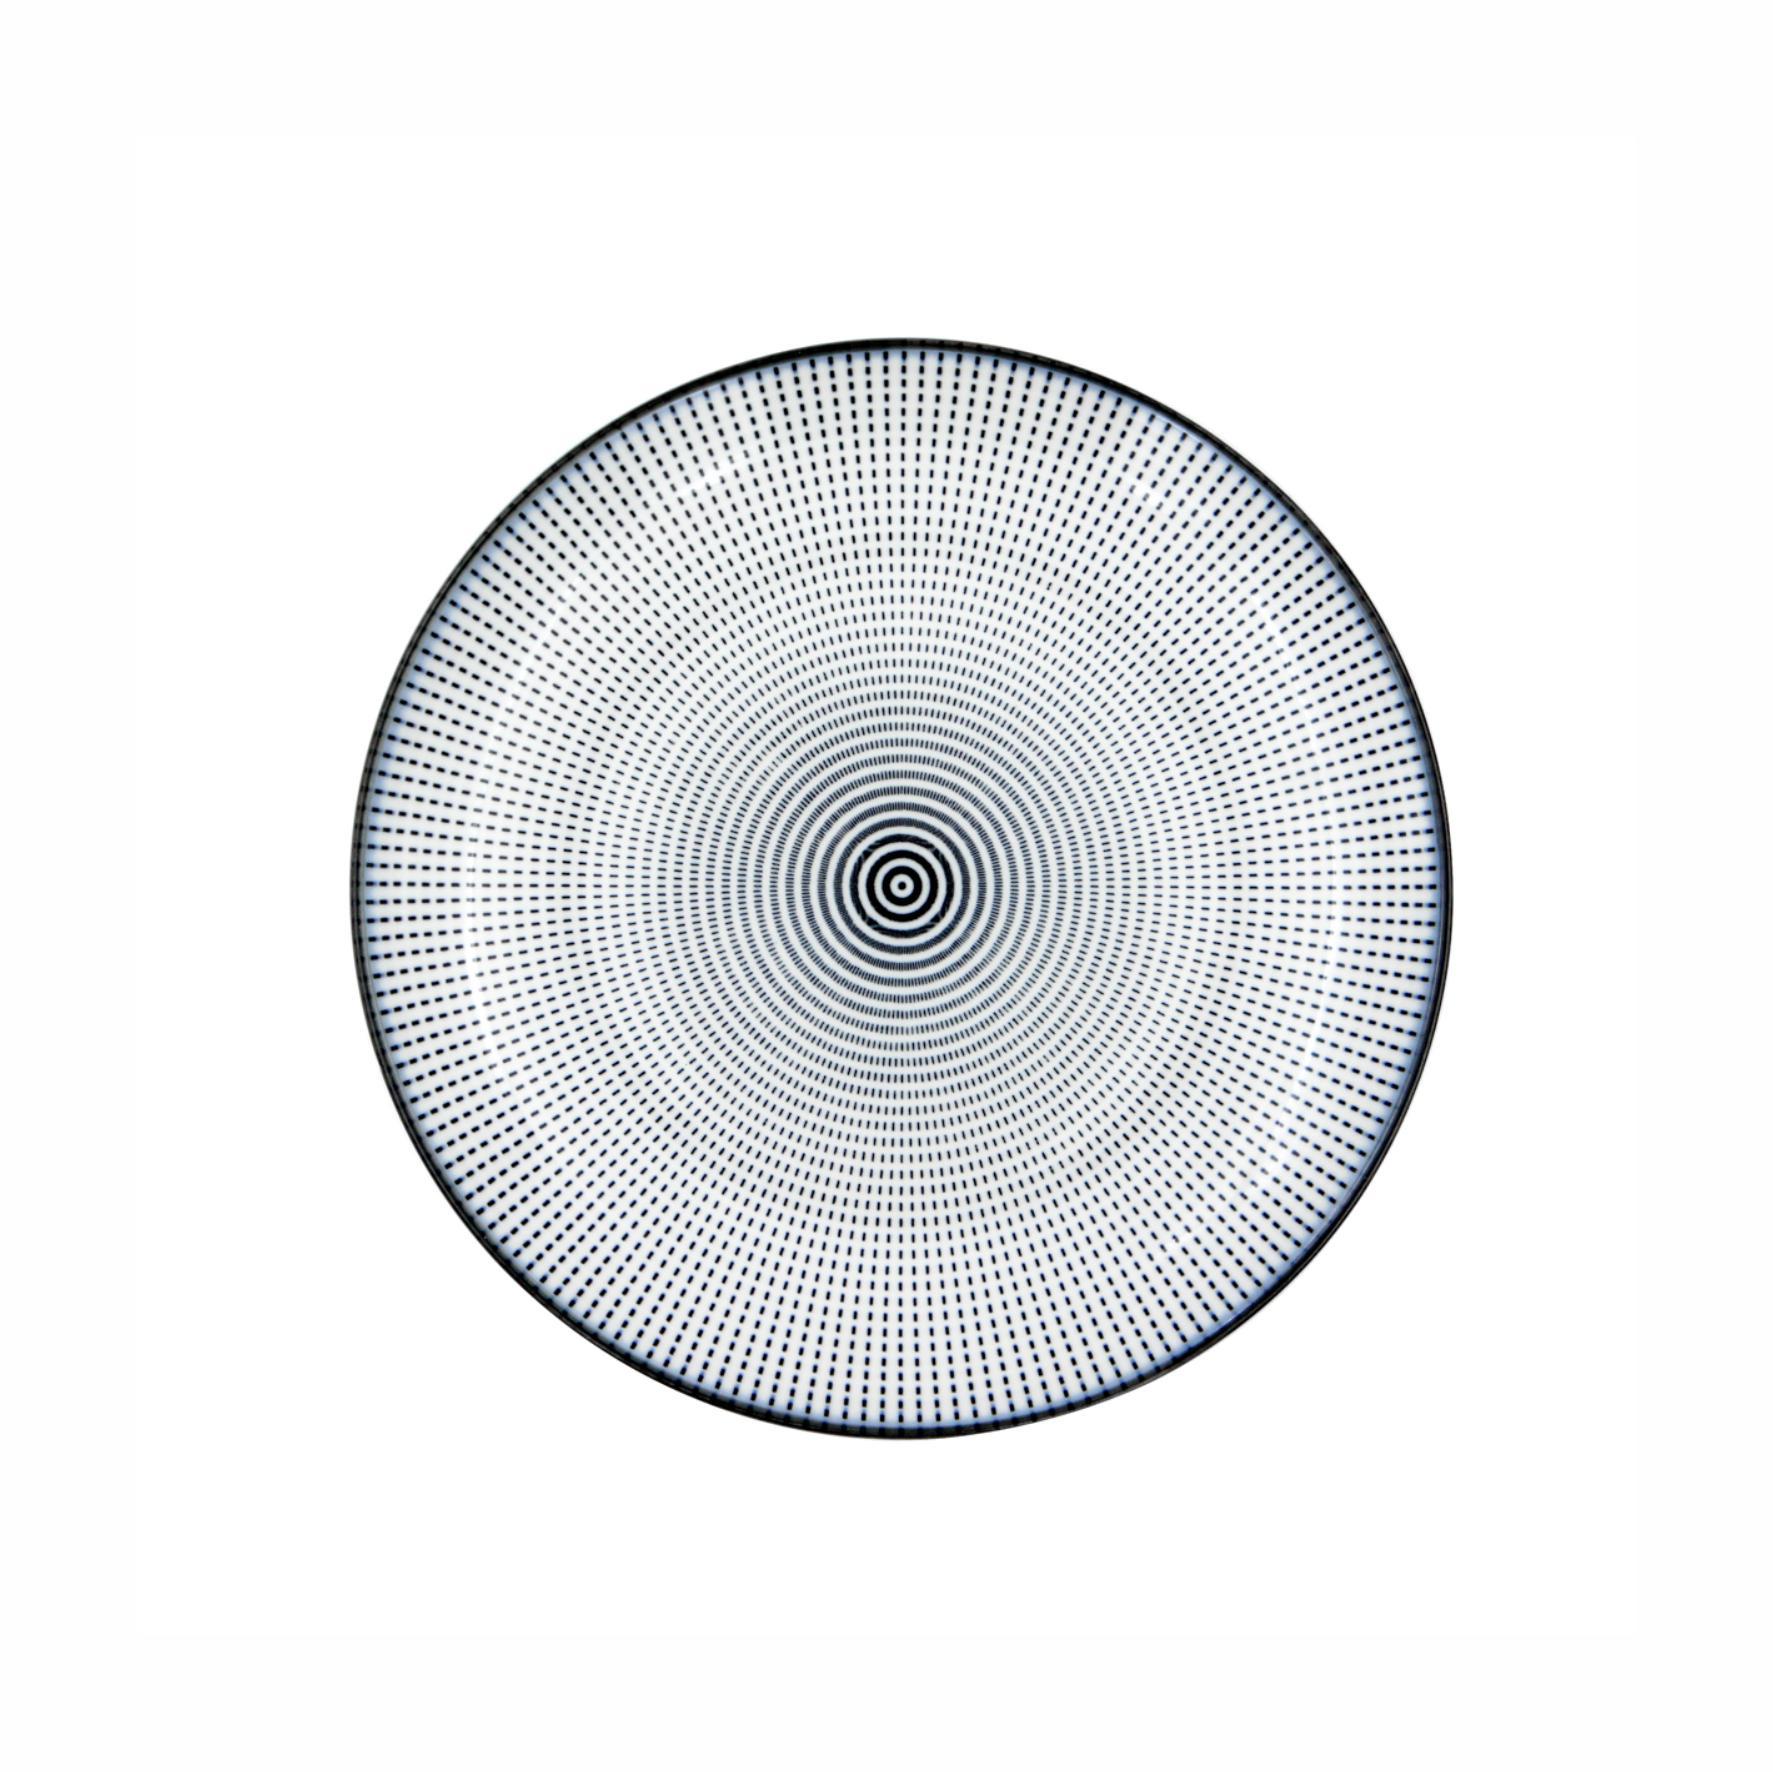 Prato Porcelana Decor Dot Angles Preto e Branco 19,5cm - Urban